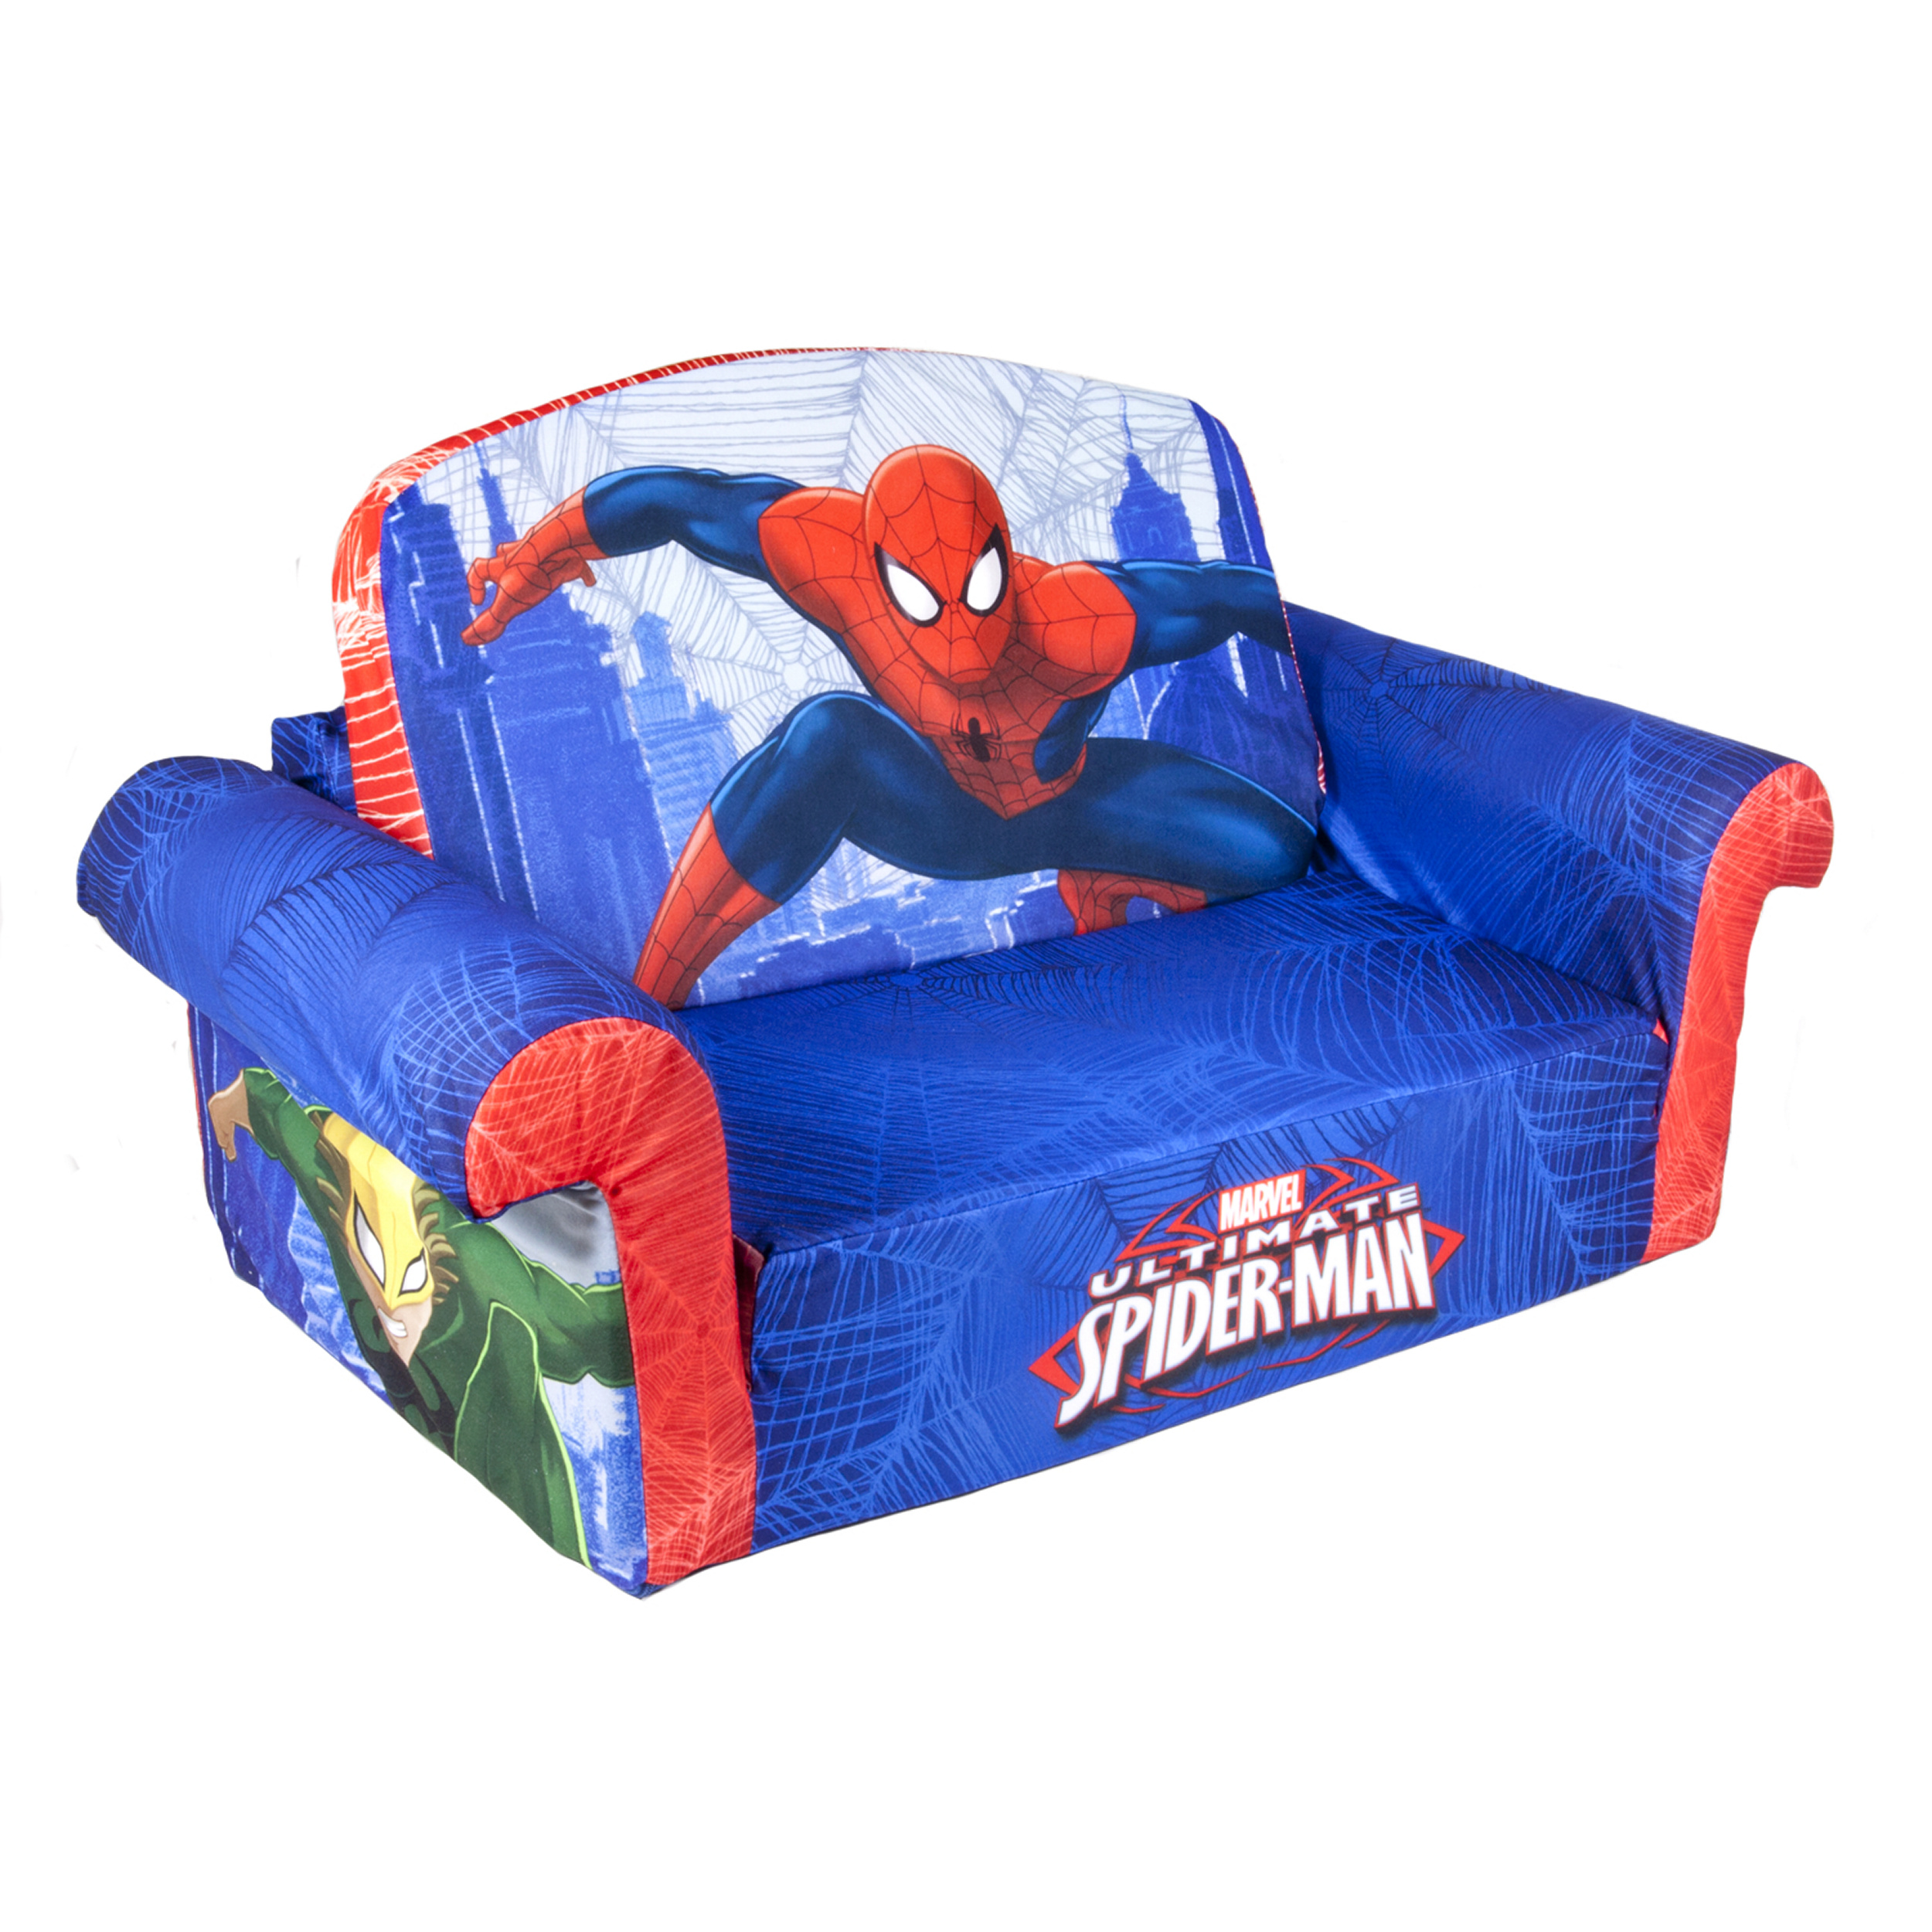 Top Quality Marshmallow Marvel Spider Man Flip Open Foam Sofa Kids  Furniture | EBay